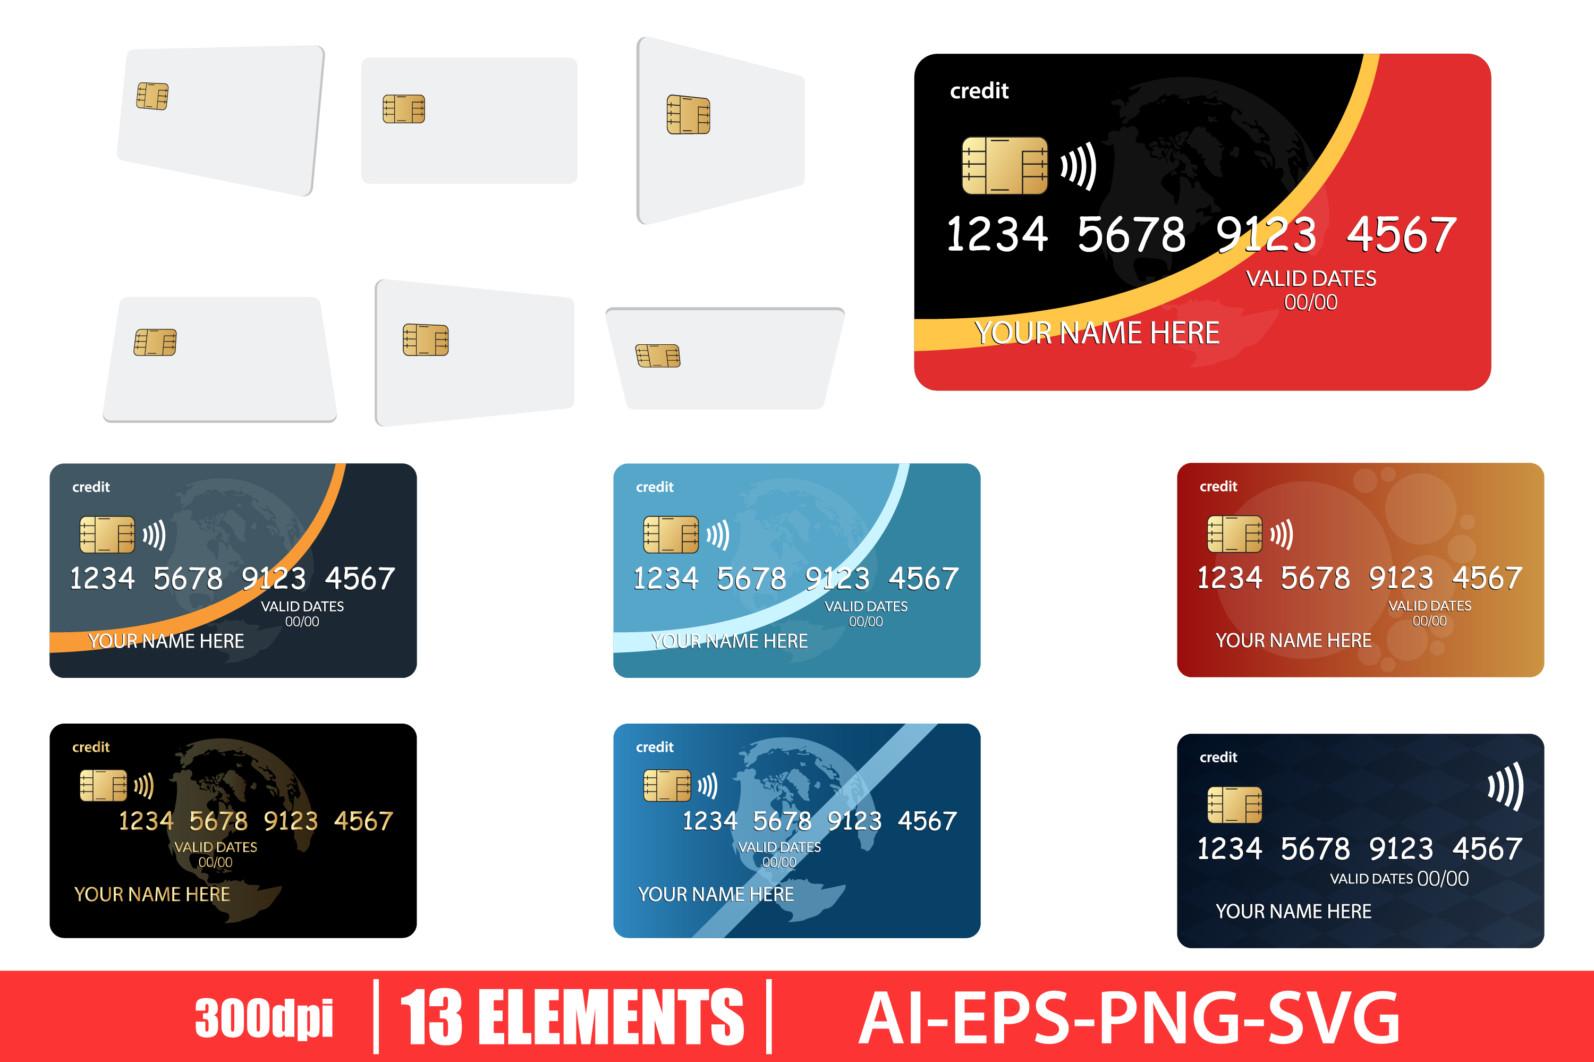 Credit card clipart vector design illustration. Credit card set. Vector Clipart Print - CREDIT CARD scaled -